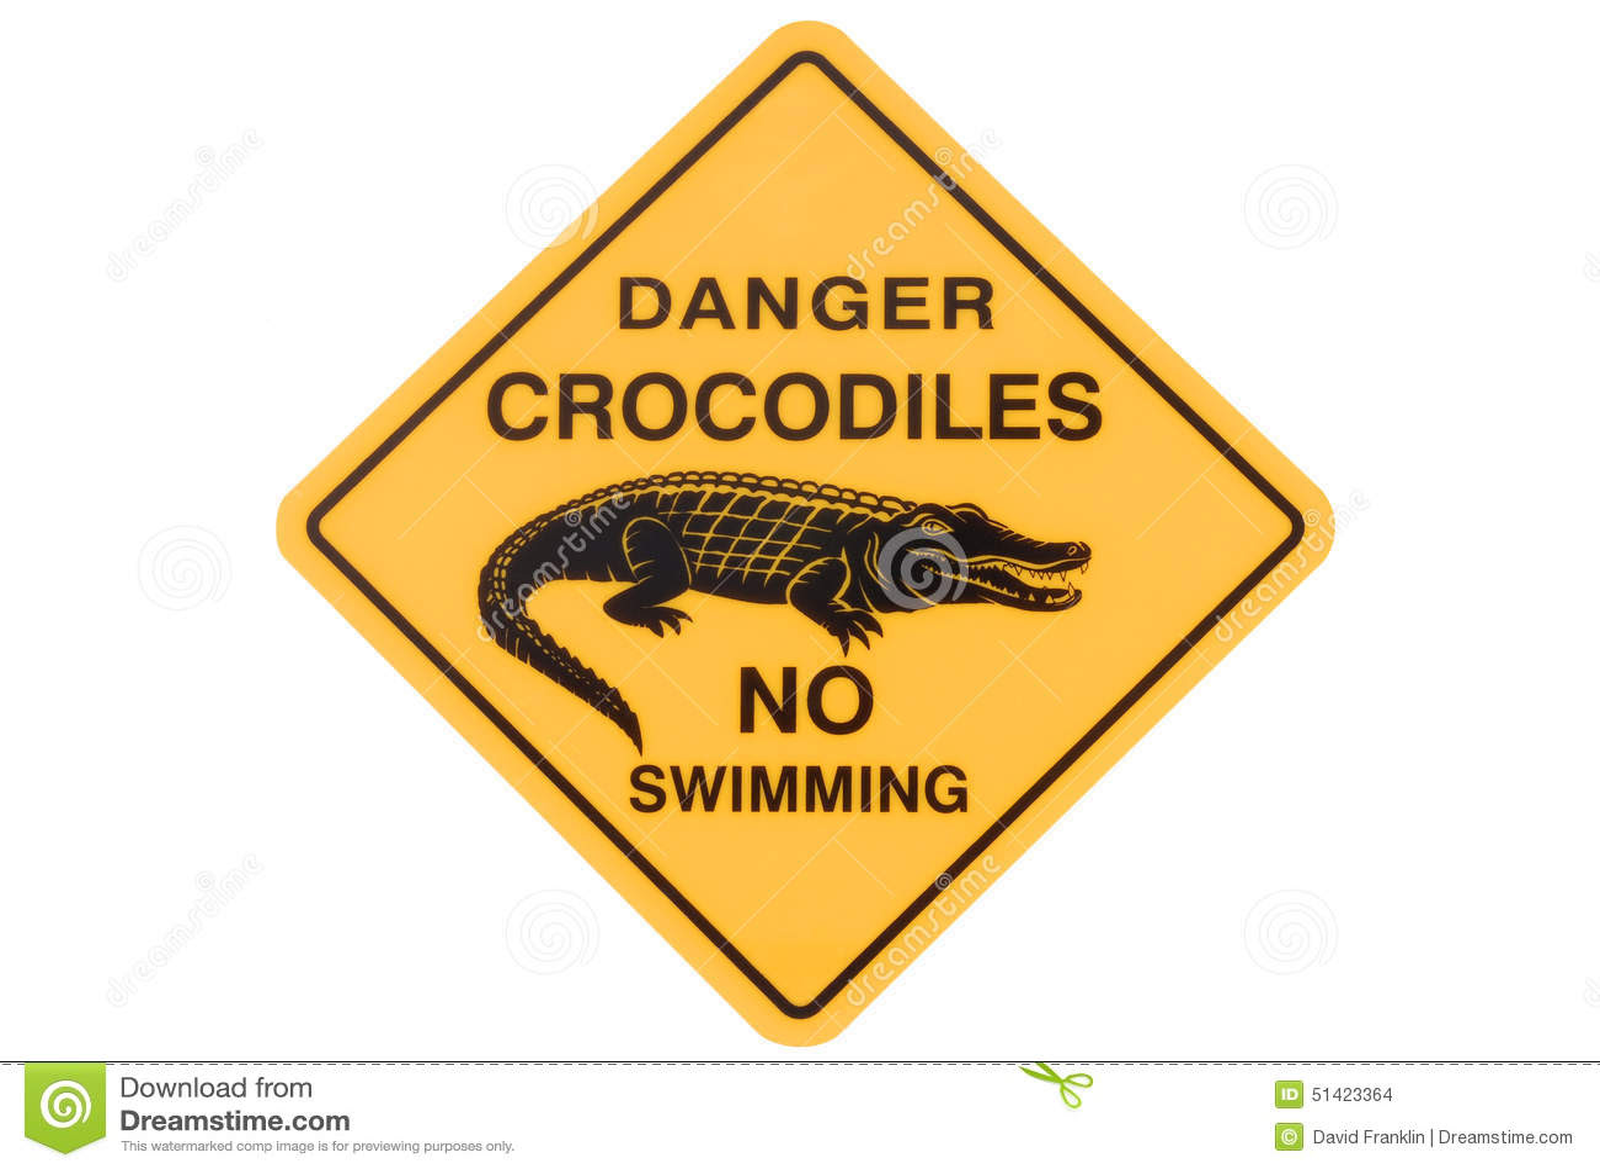 crocodile warning sign australian road no swimming isolated white background 51423364